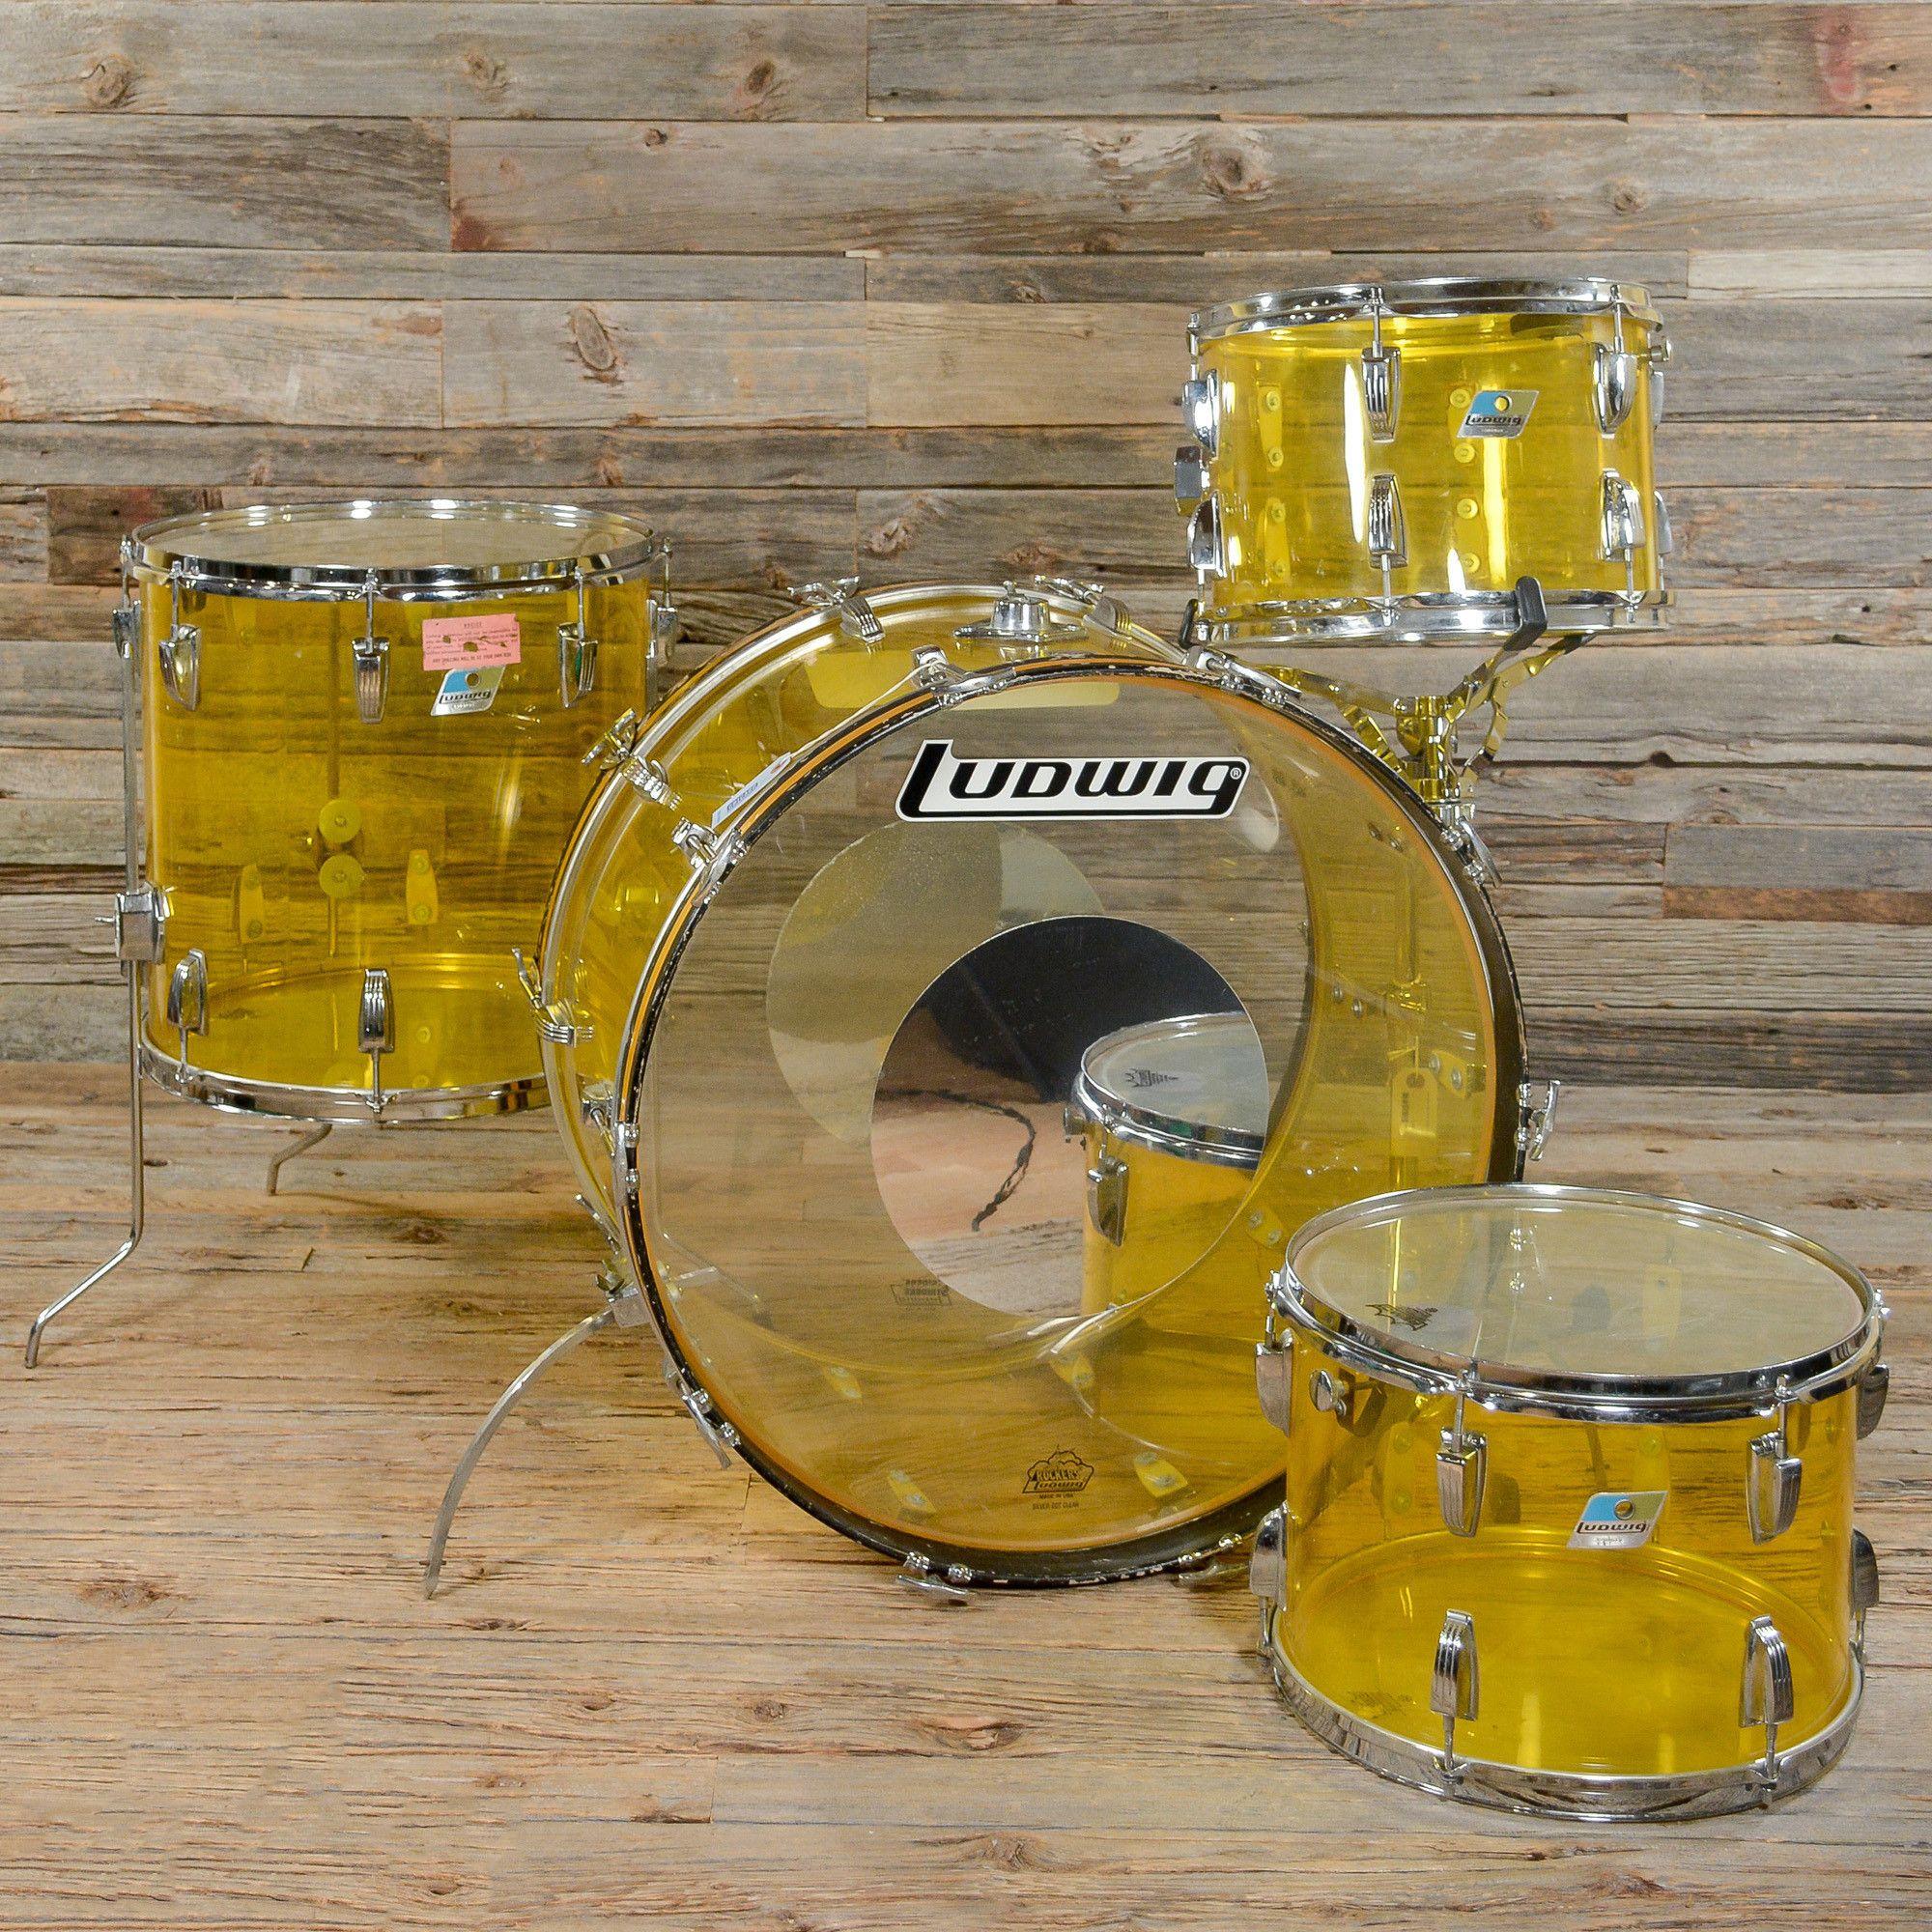 Ludwig Vistalite 13141624 4Pc Drum Kit Yellow 70S